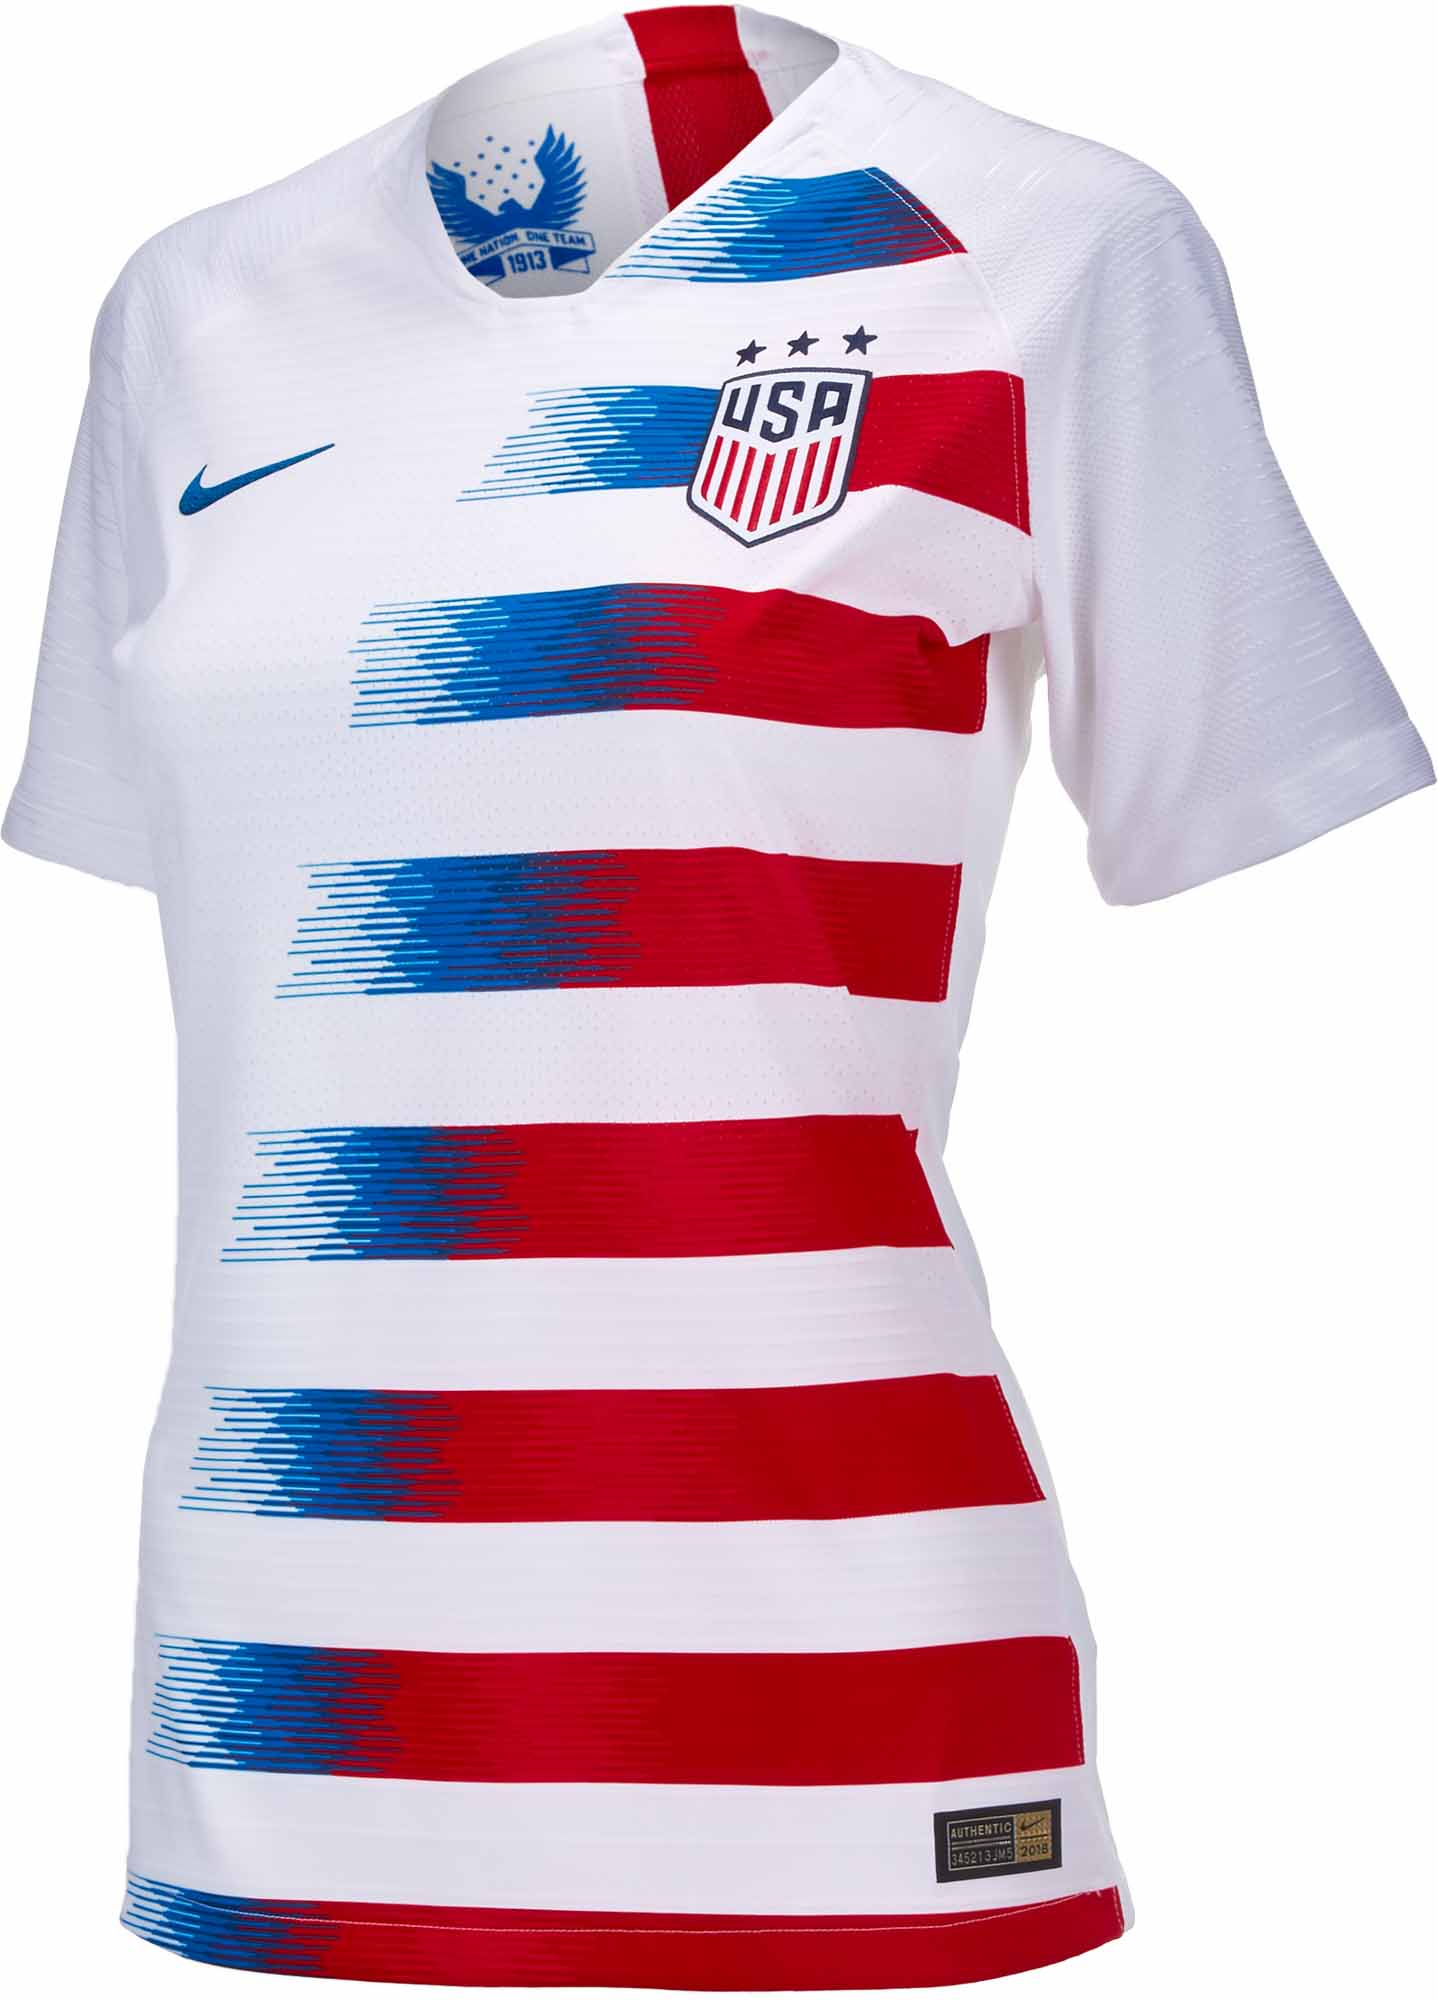 de4b3635e Nike USA Home Match Jersey - Womens 2018-19 - Soccer Master